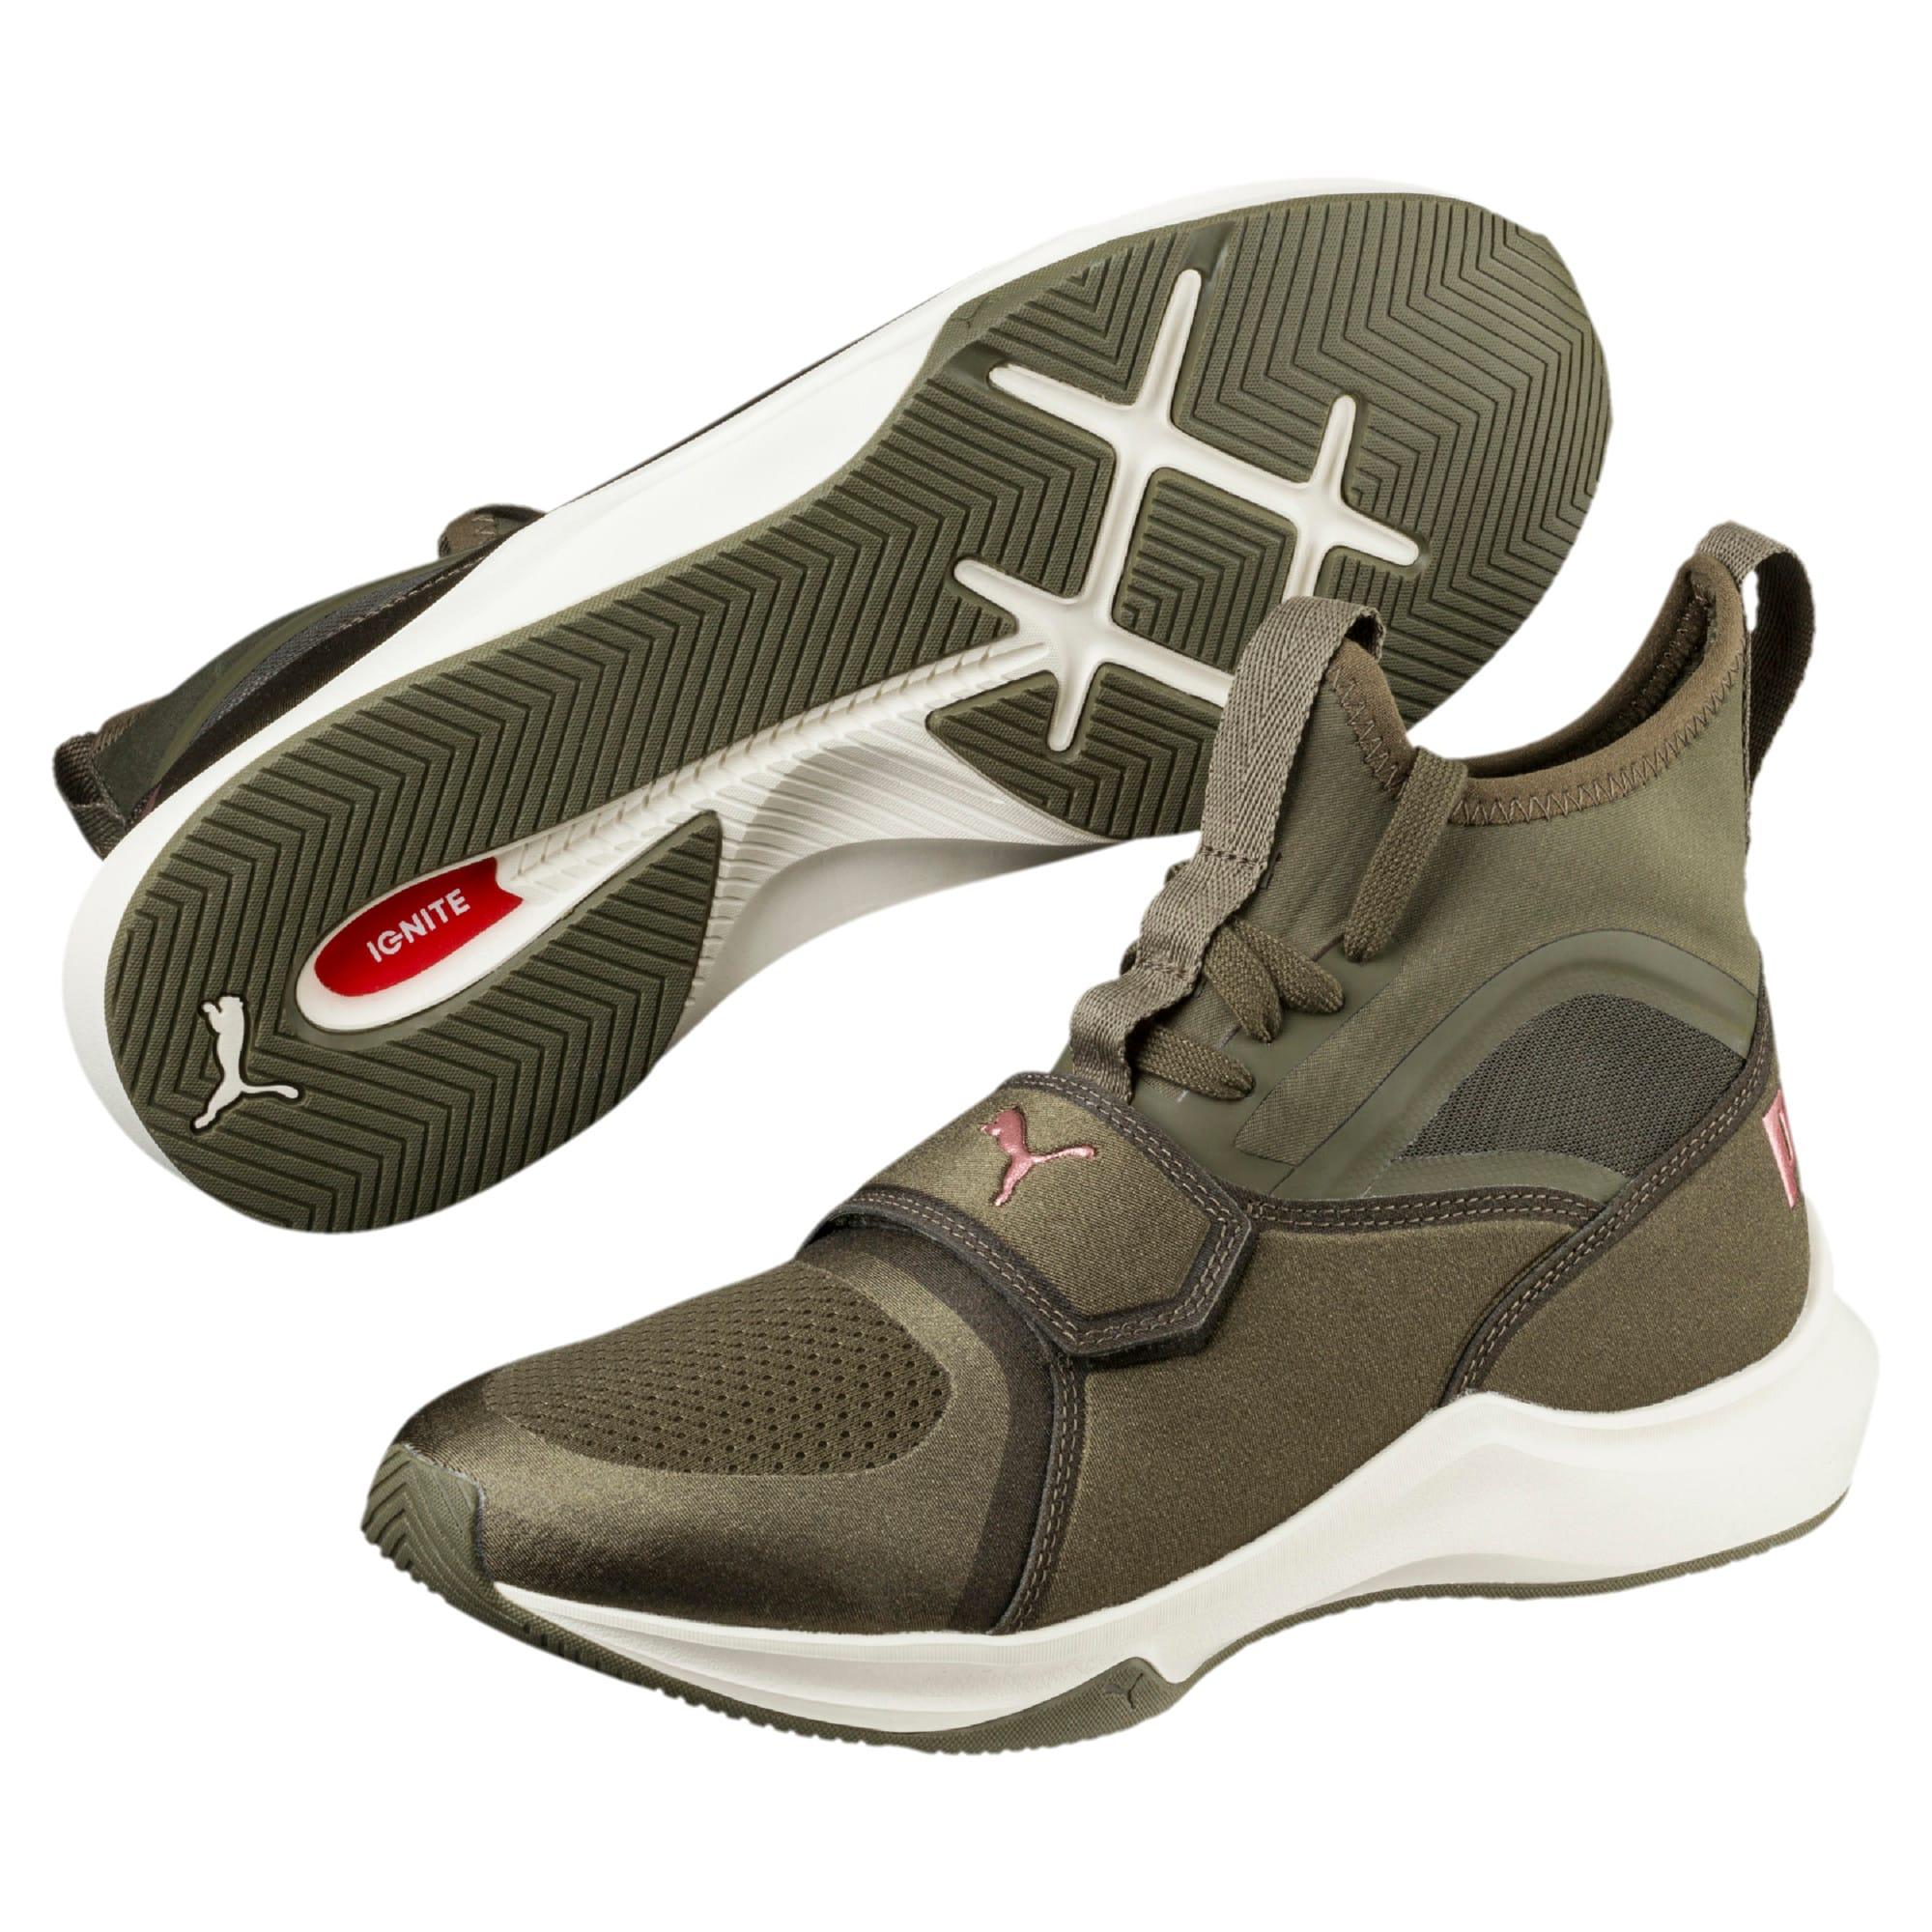 Thumbnail 2 of Phenom Women's Training Shoes, Olive Night-Whisper White, medium